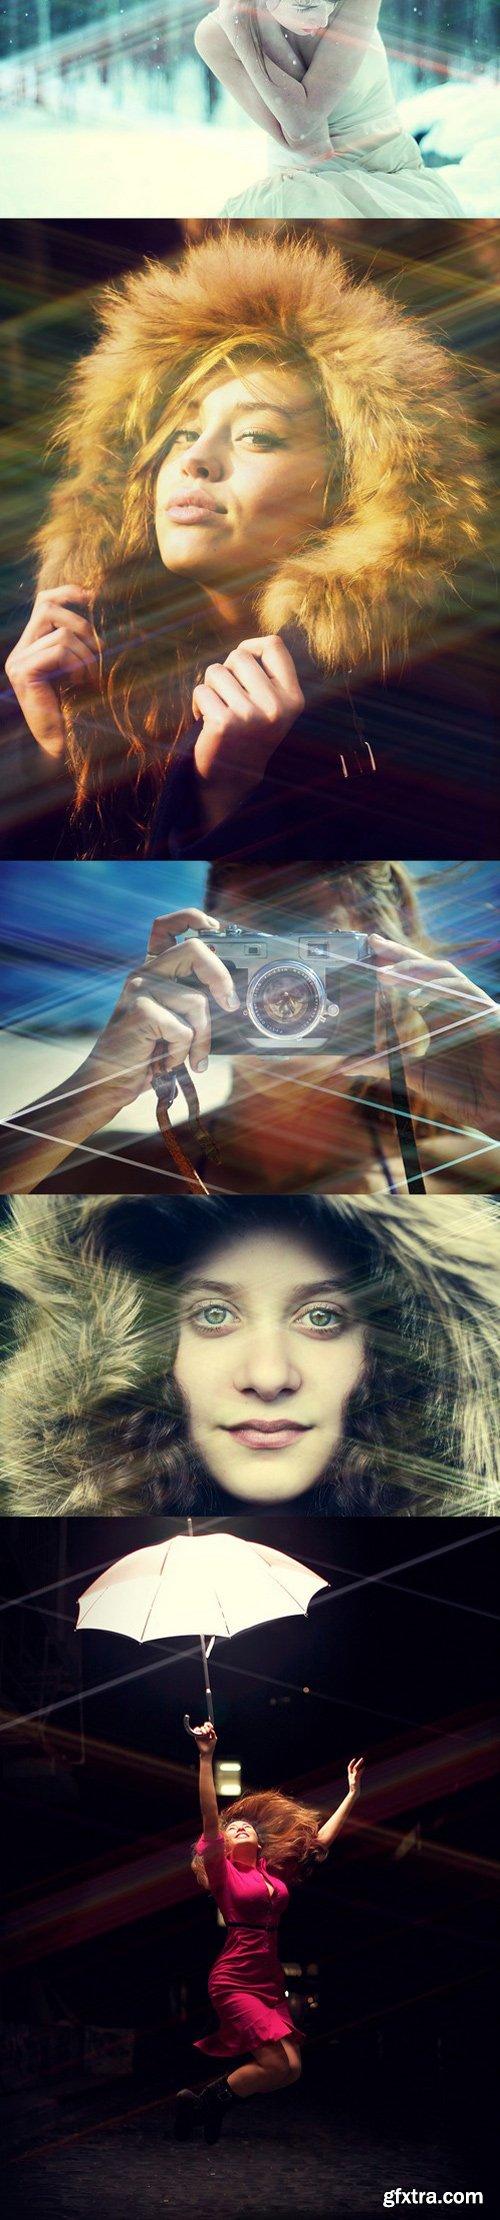 CM - Photoshop Add-Ons Bundle 502575